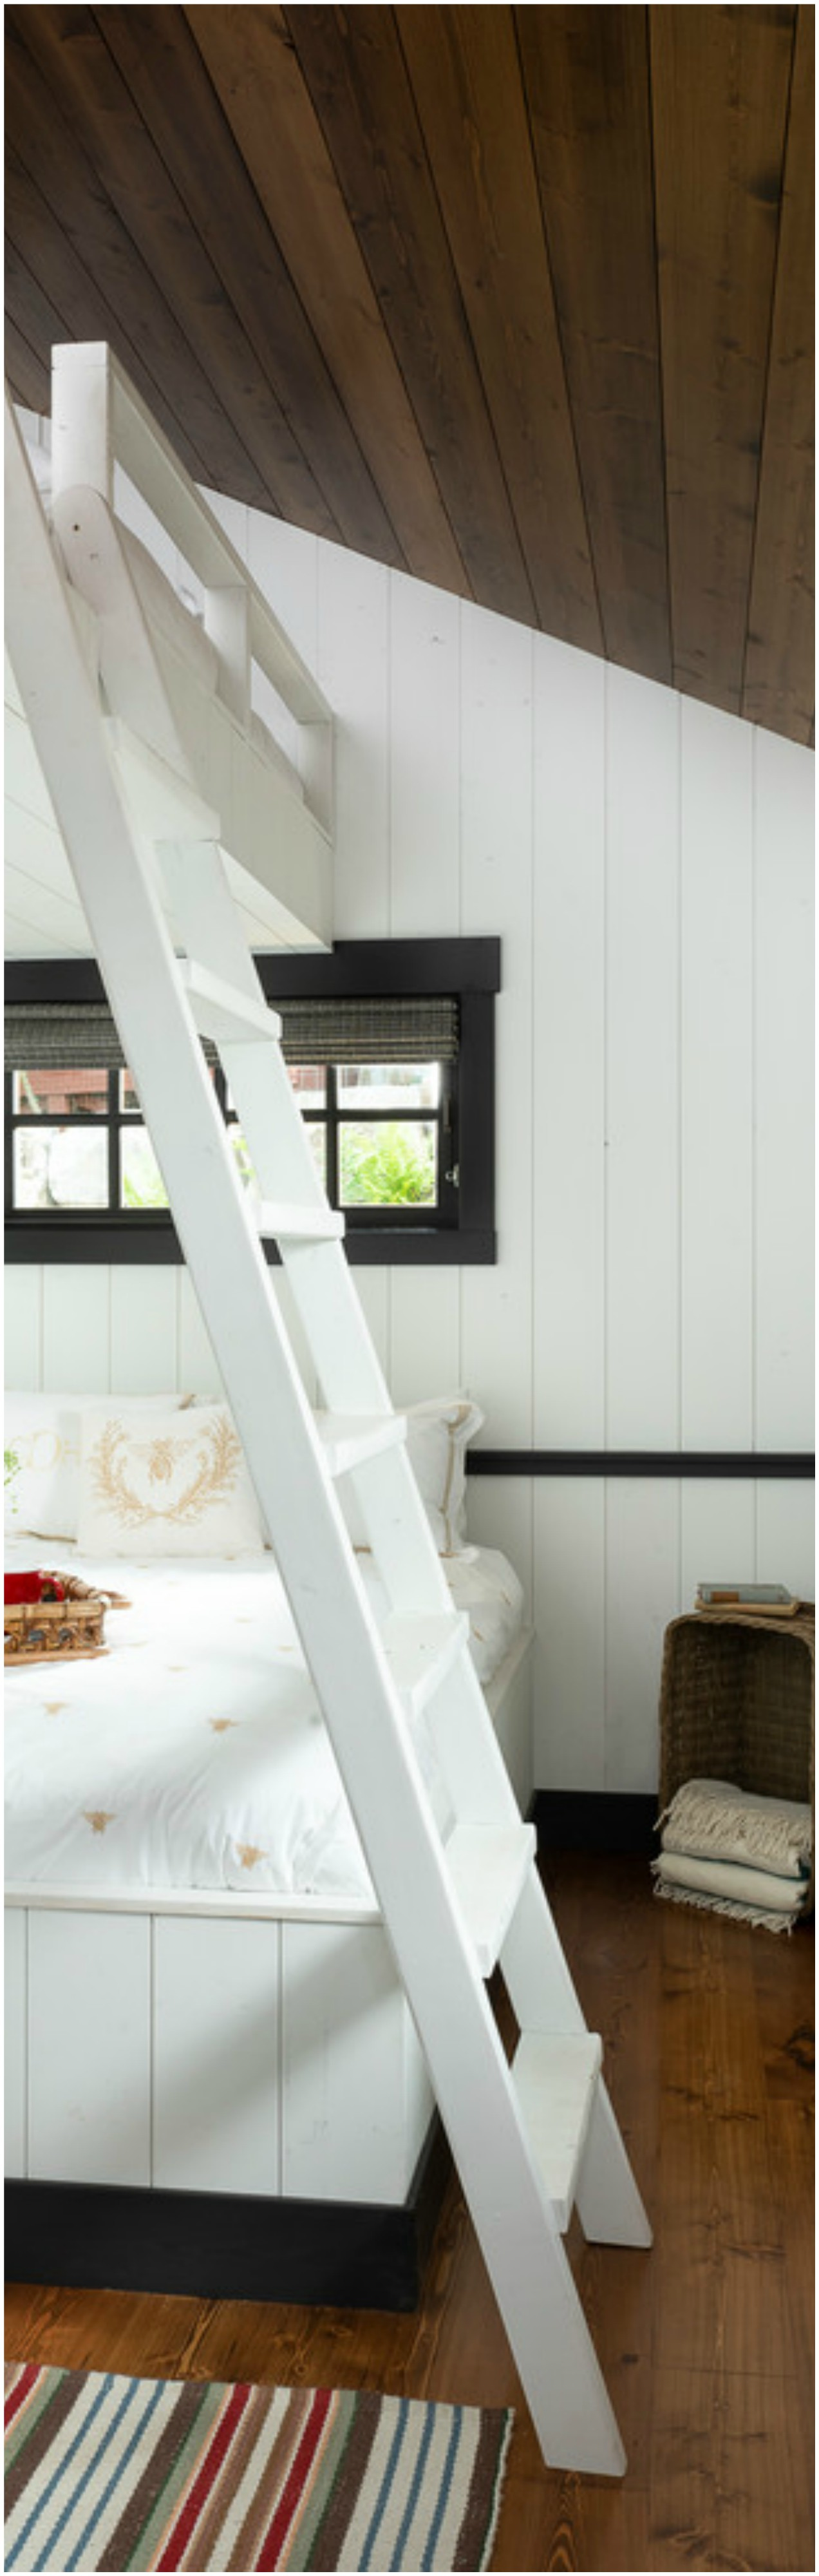 Rustic Bedroom Design Inspiration (34)